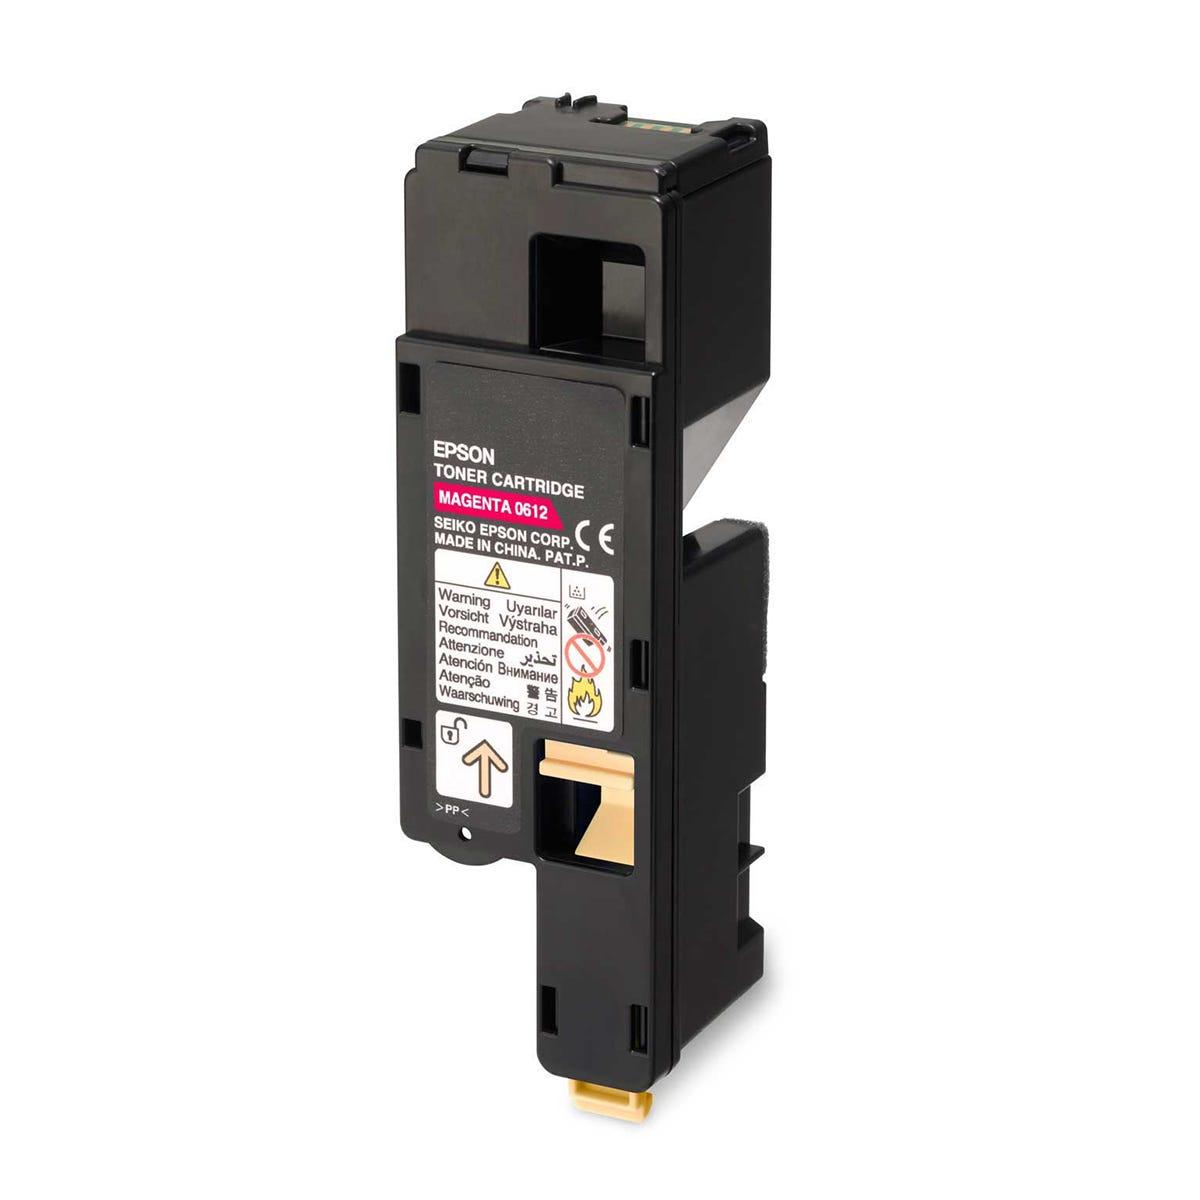 Epson Aculaser C1700 Toner Cartridge High Yield, Magenta.